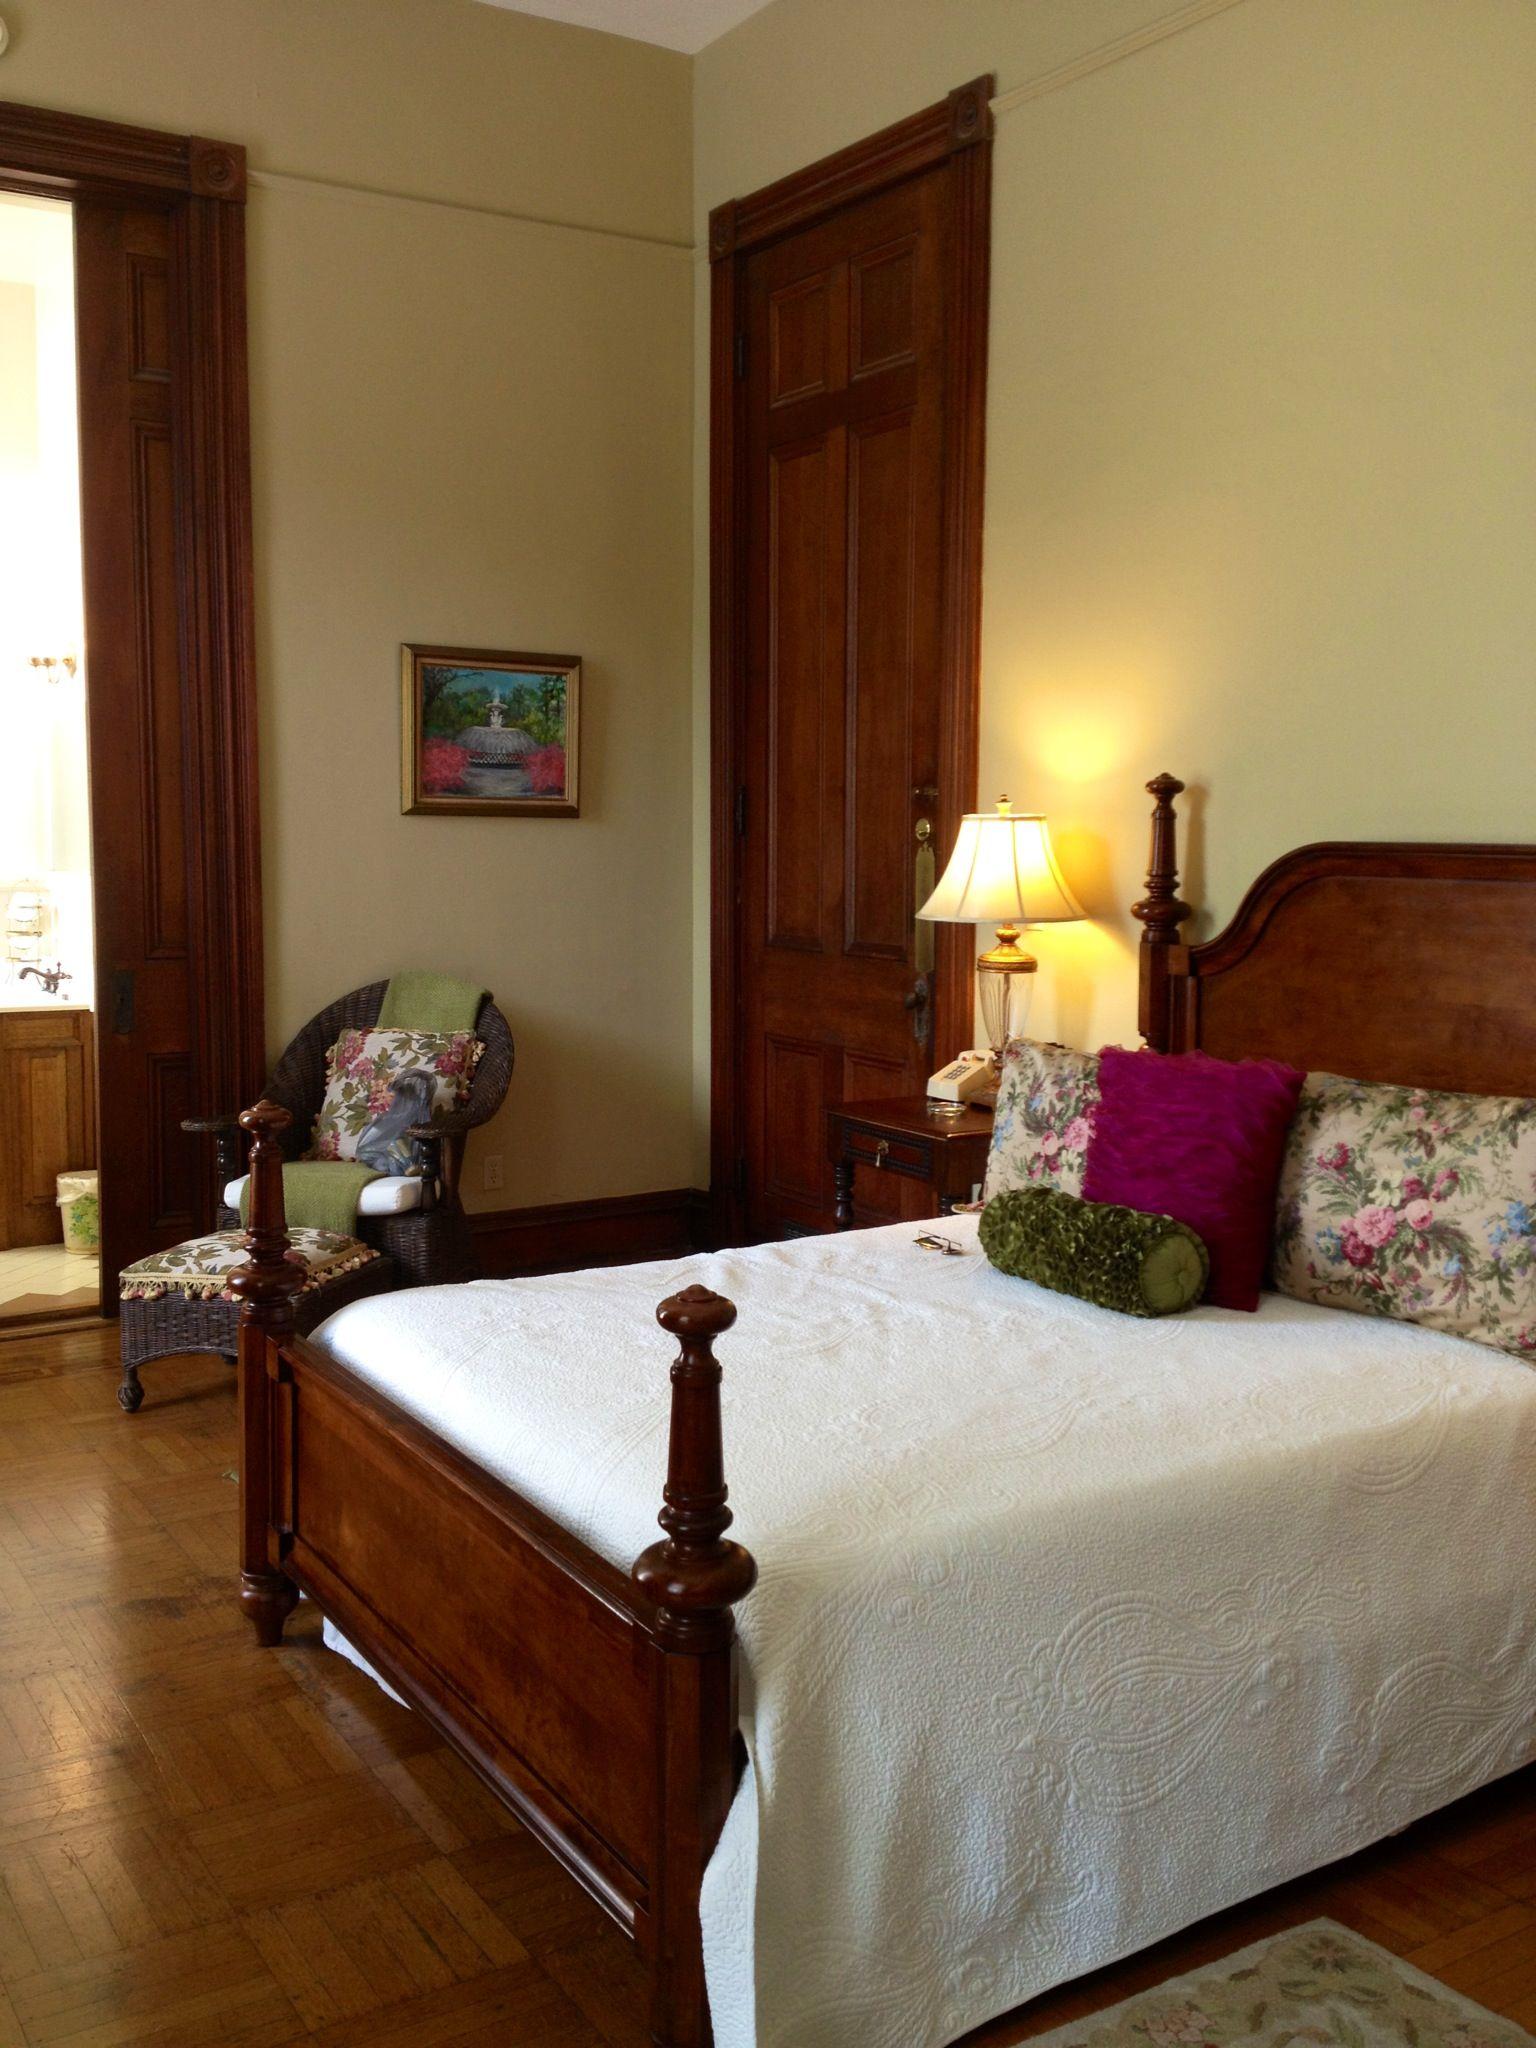 Forsyth Inn Park Bed and Breakfast in Savannah, Ga. Bed